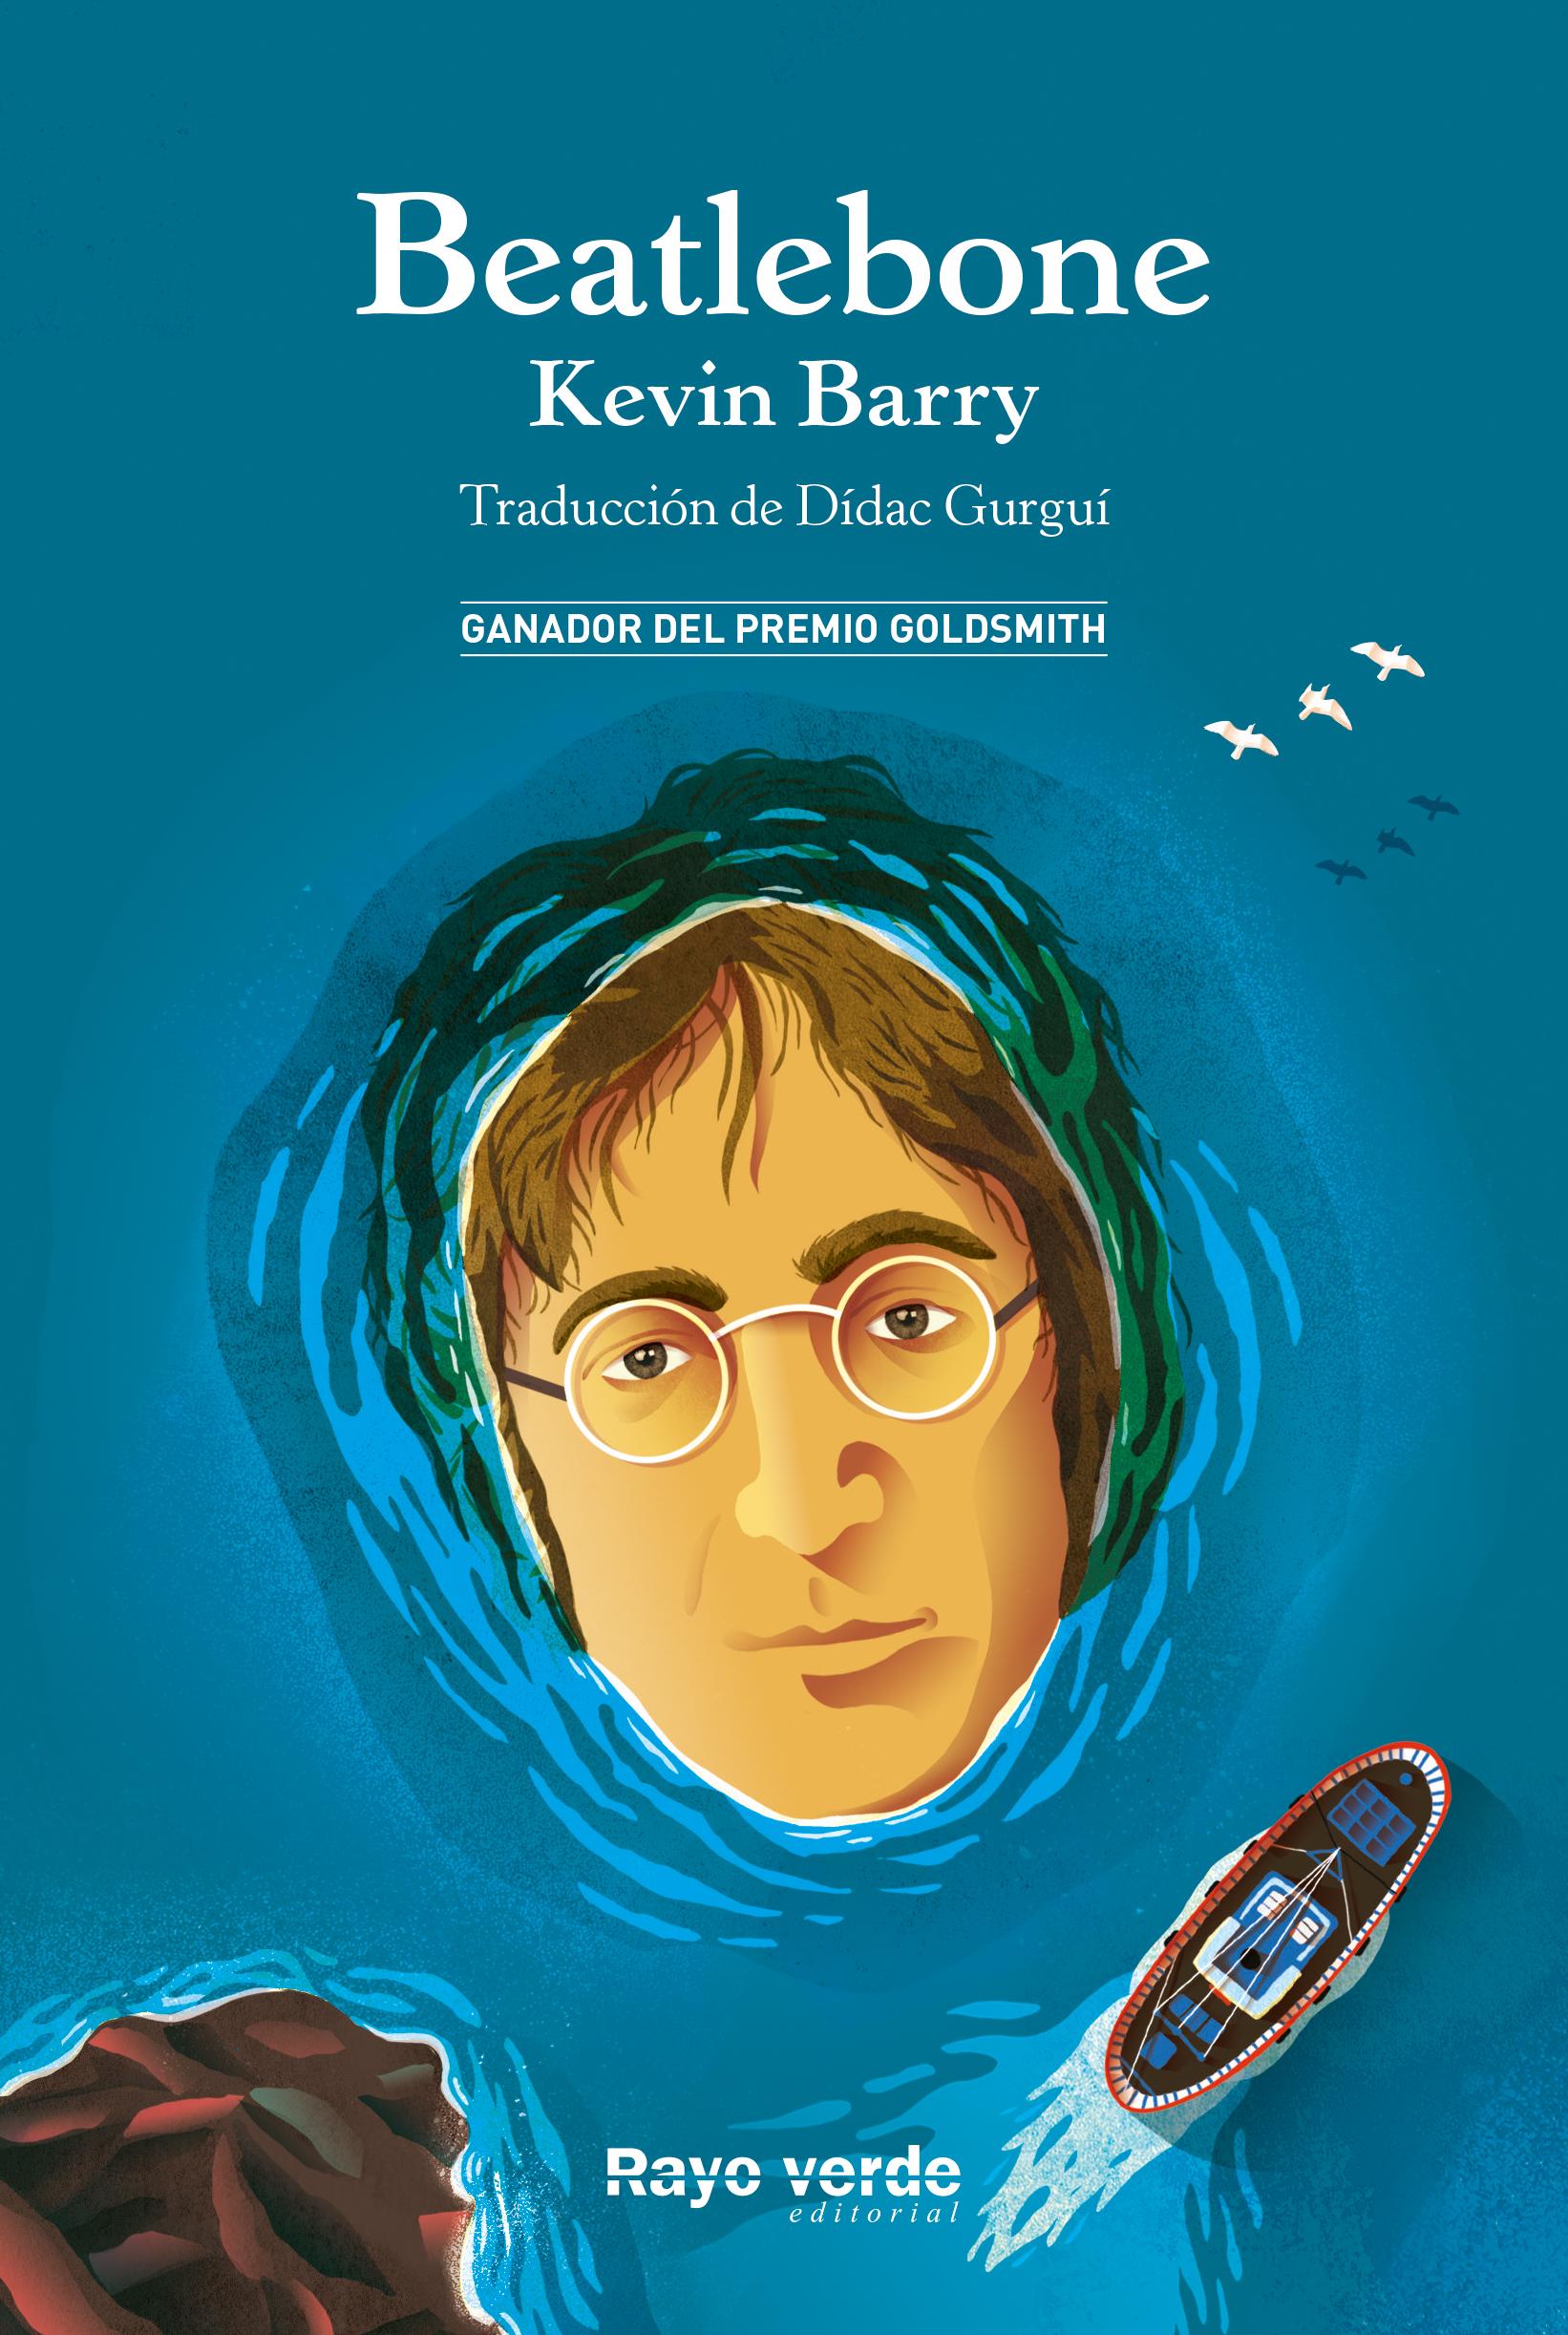 Kevin Barry Beatlebone barry white barry white stone gon